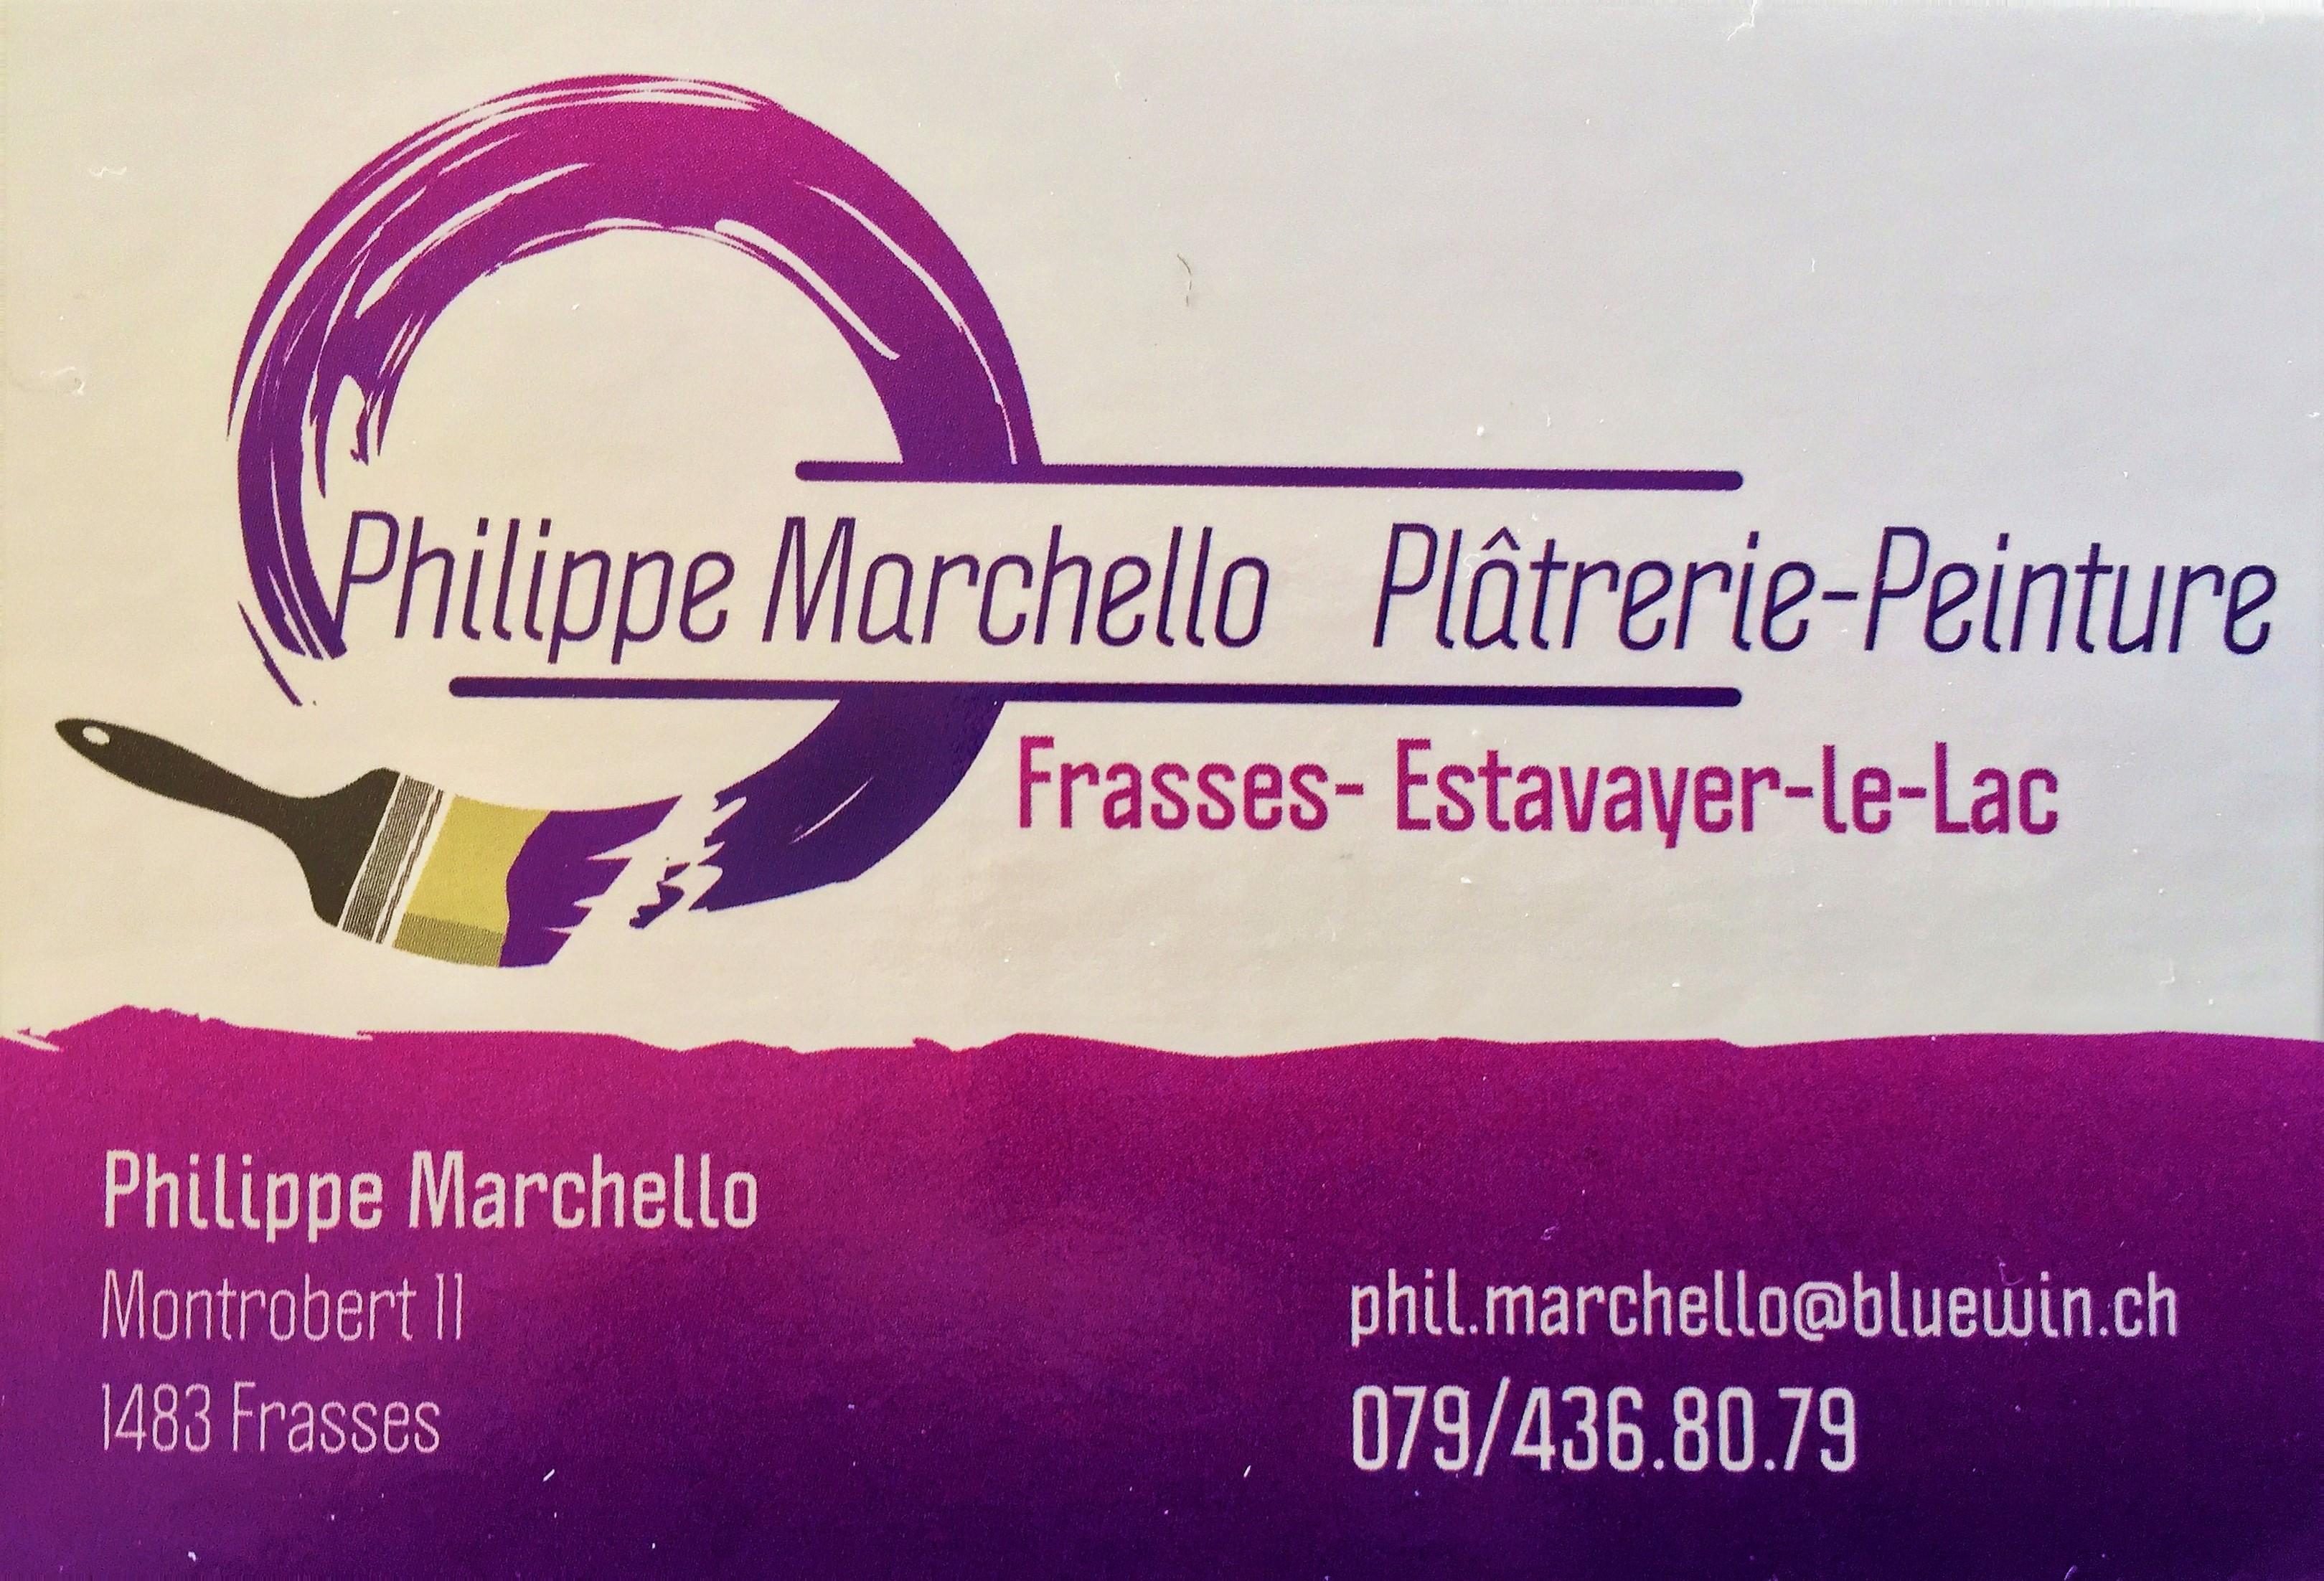 Philippe Marchello Plâtrerie - Peinture